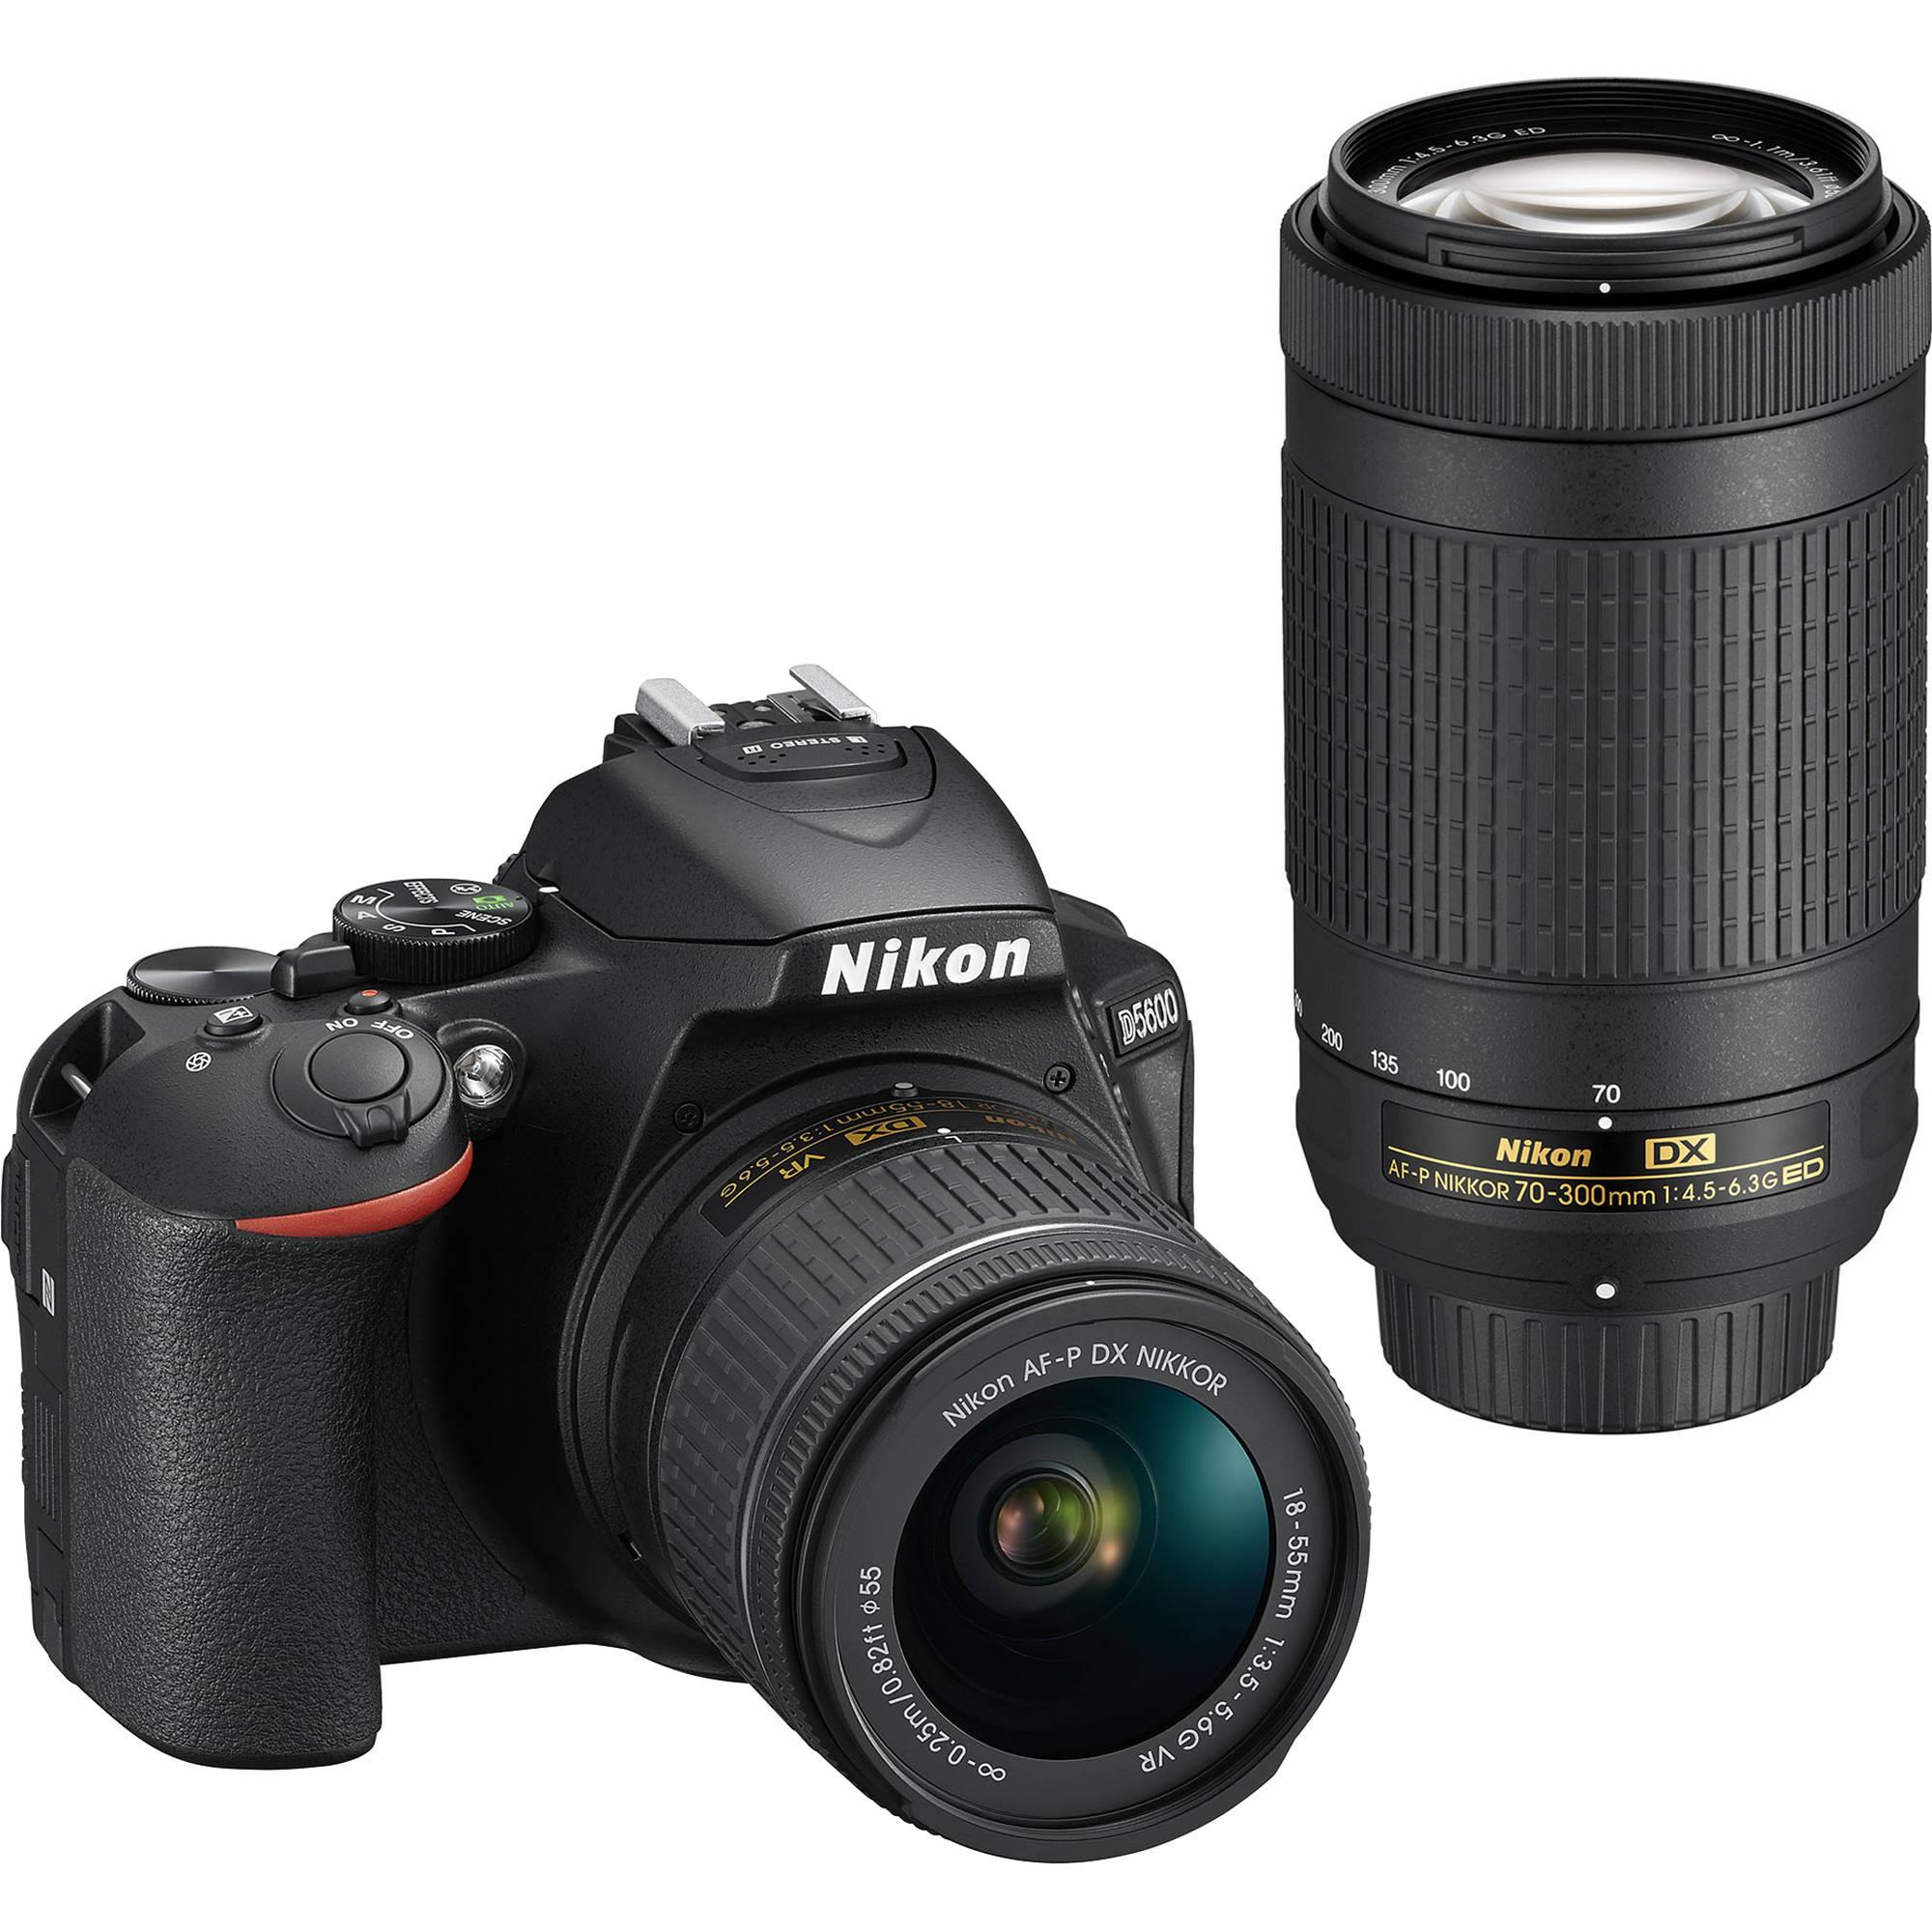 Smartly Nikon Dslr Camera And Lenses Compare Nikon Vs Nikon Vs Nikon Photo Nikon D3300 Vs D5300 Video Test Nikon D3300 Vs D5300 Snapsort dpreview Nikon D3300 Vs D5300